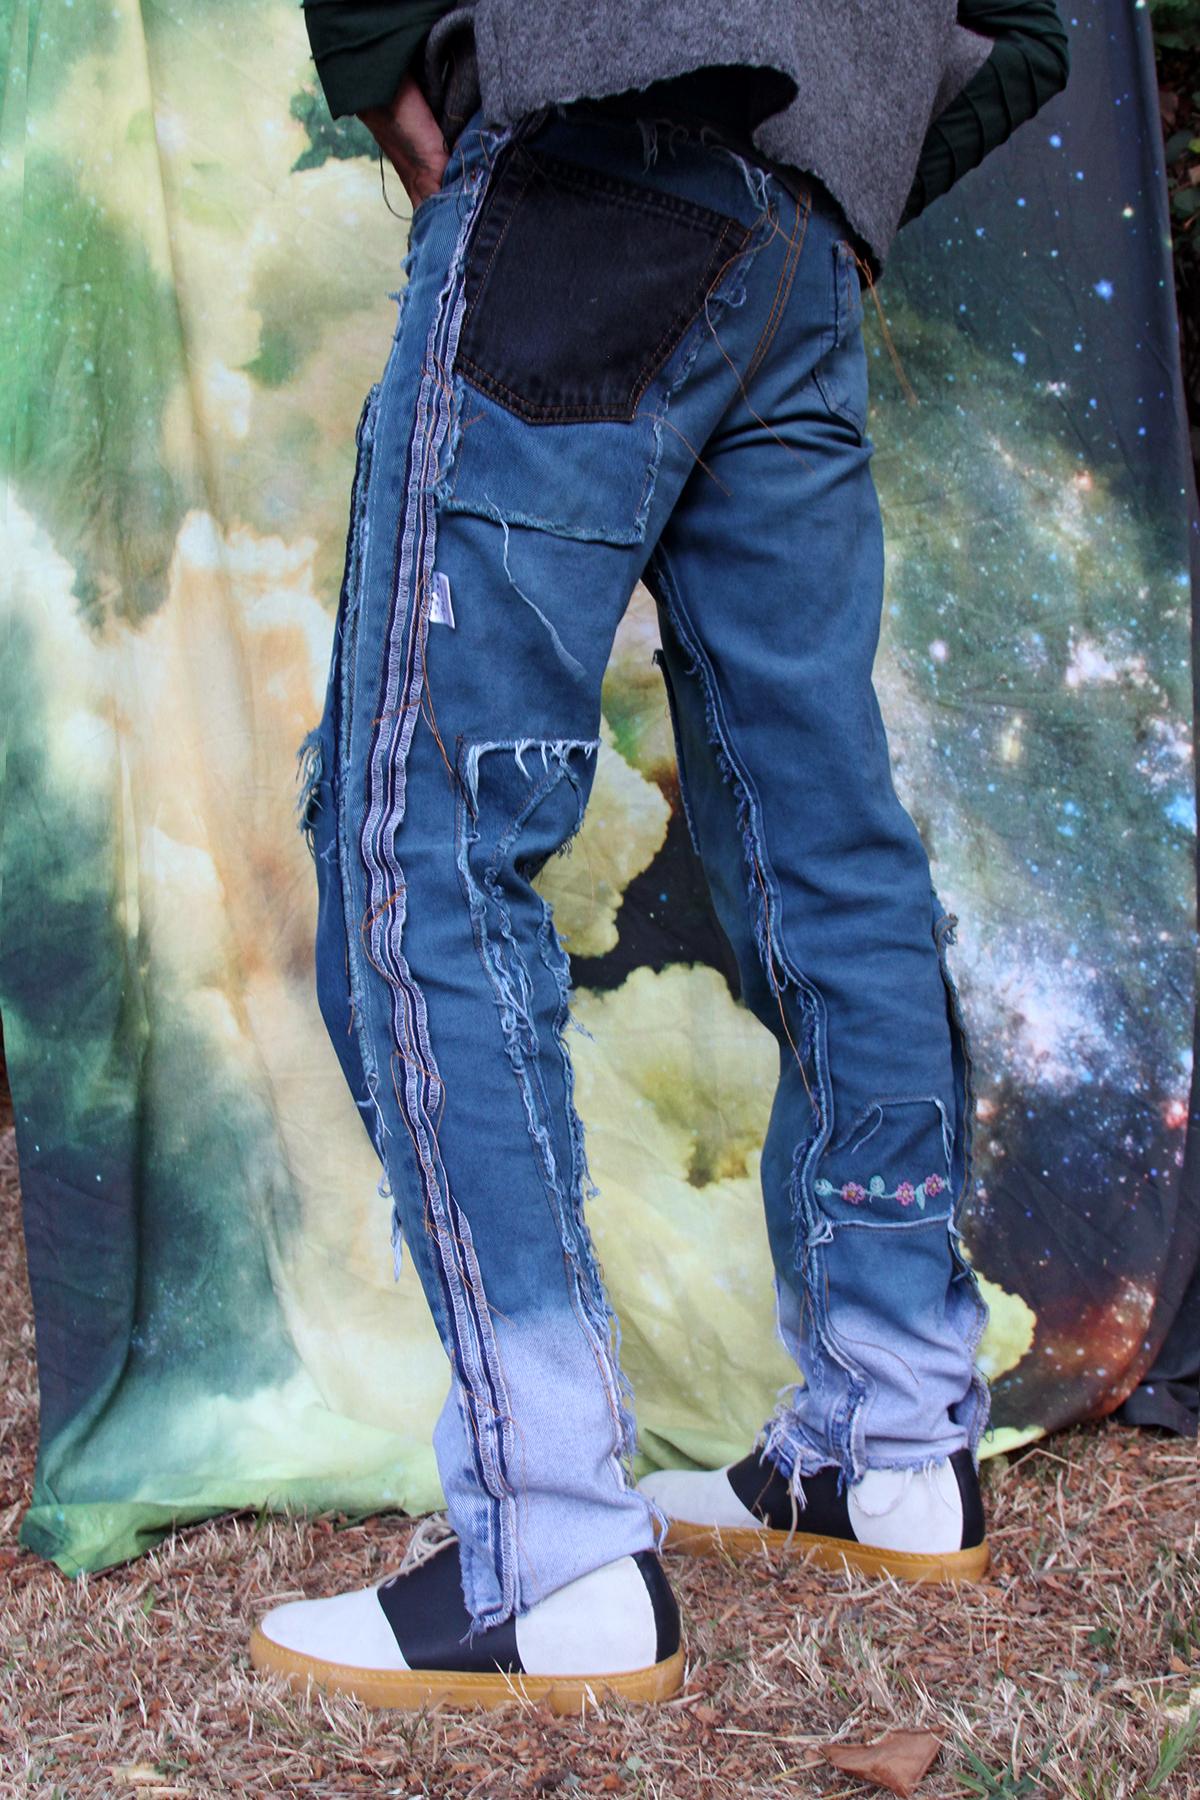 John_Stars_Jeans_1_Web.jpg